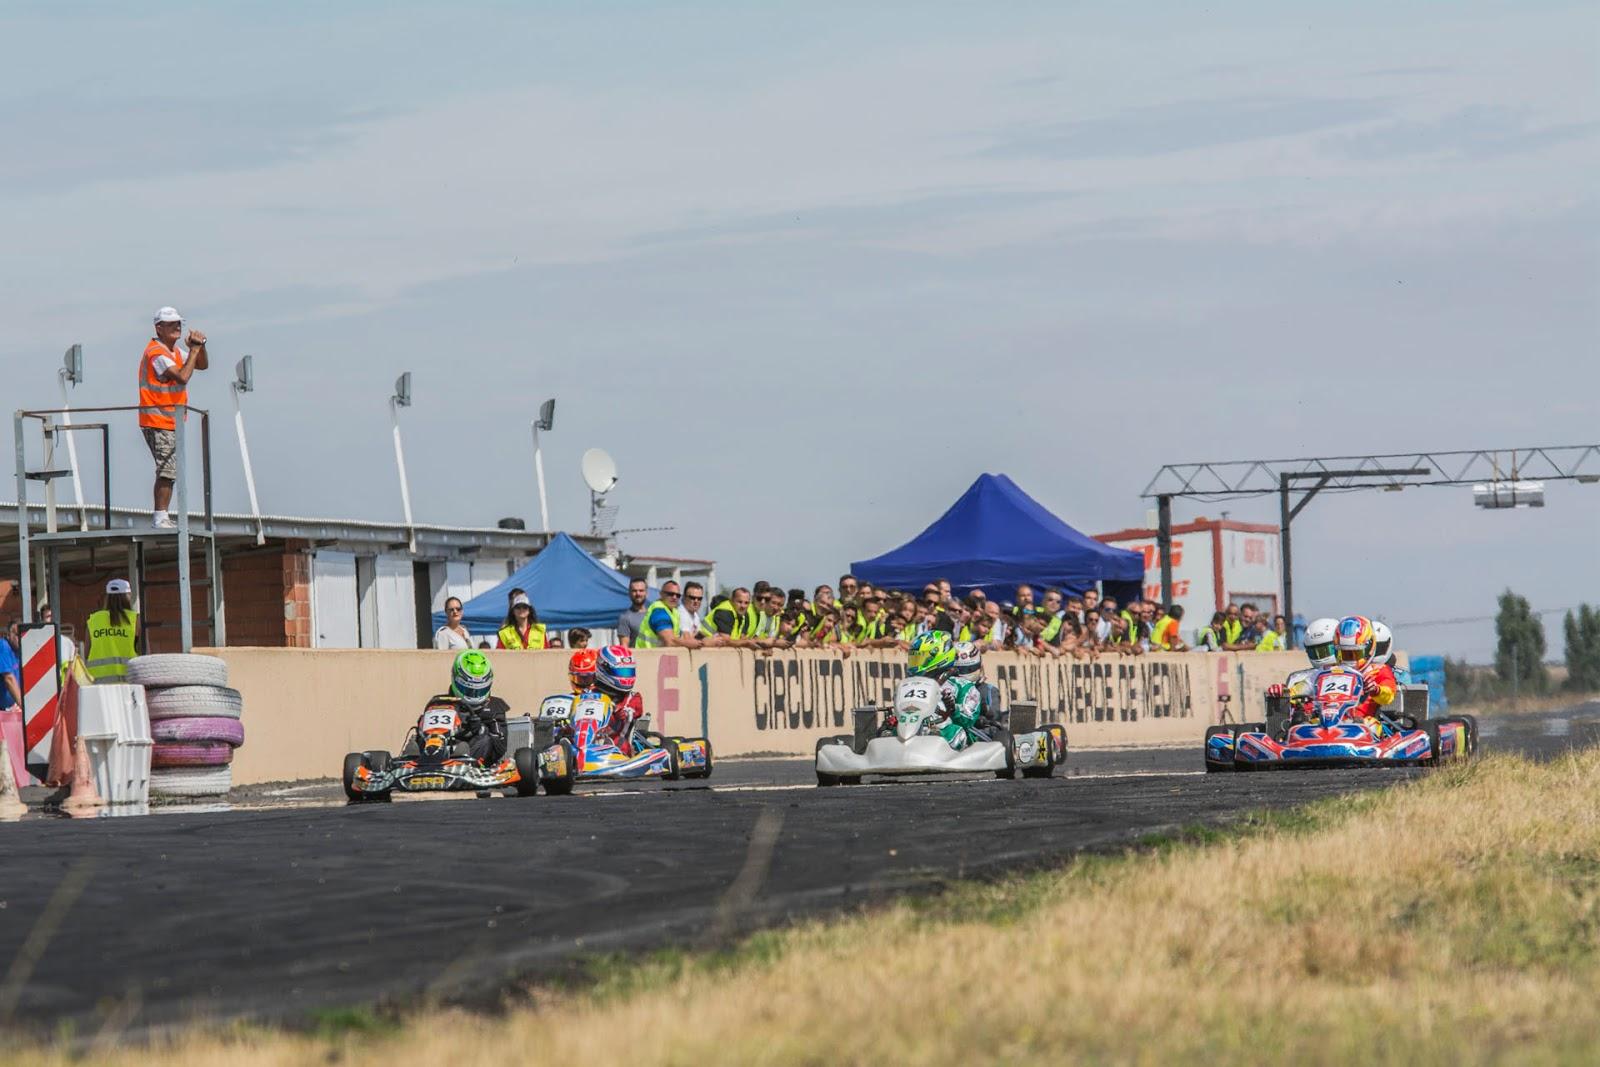 Circuito Fk1 : Amigos del karting 2t zona centro: 2017